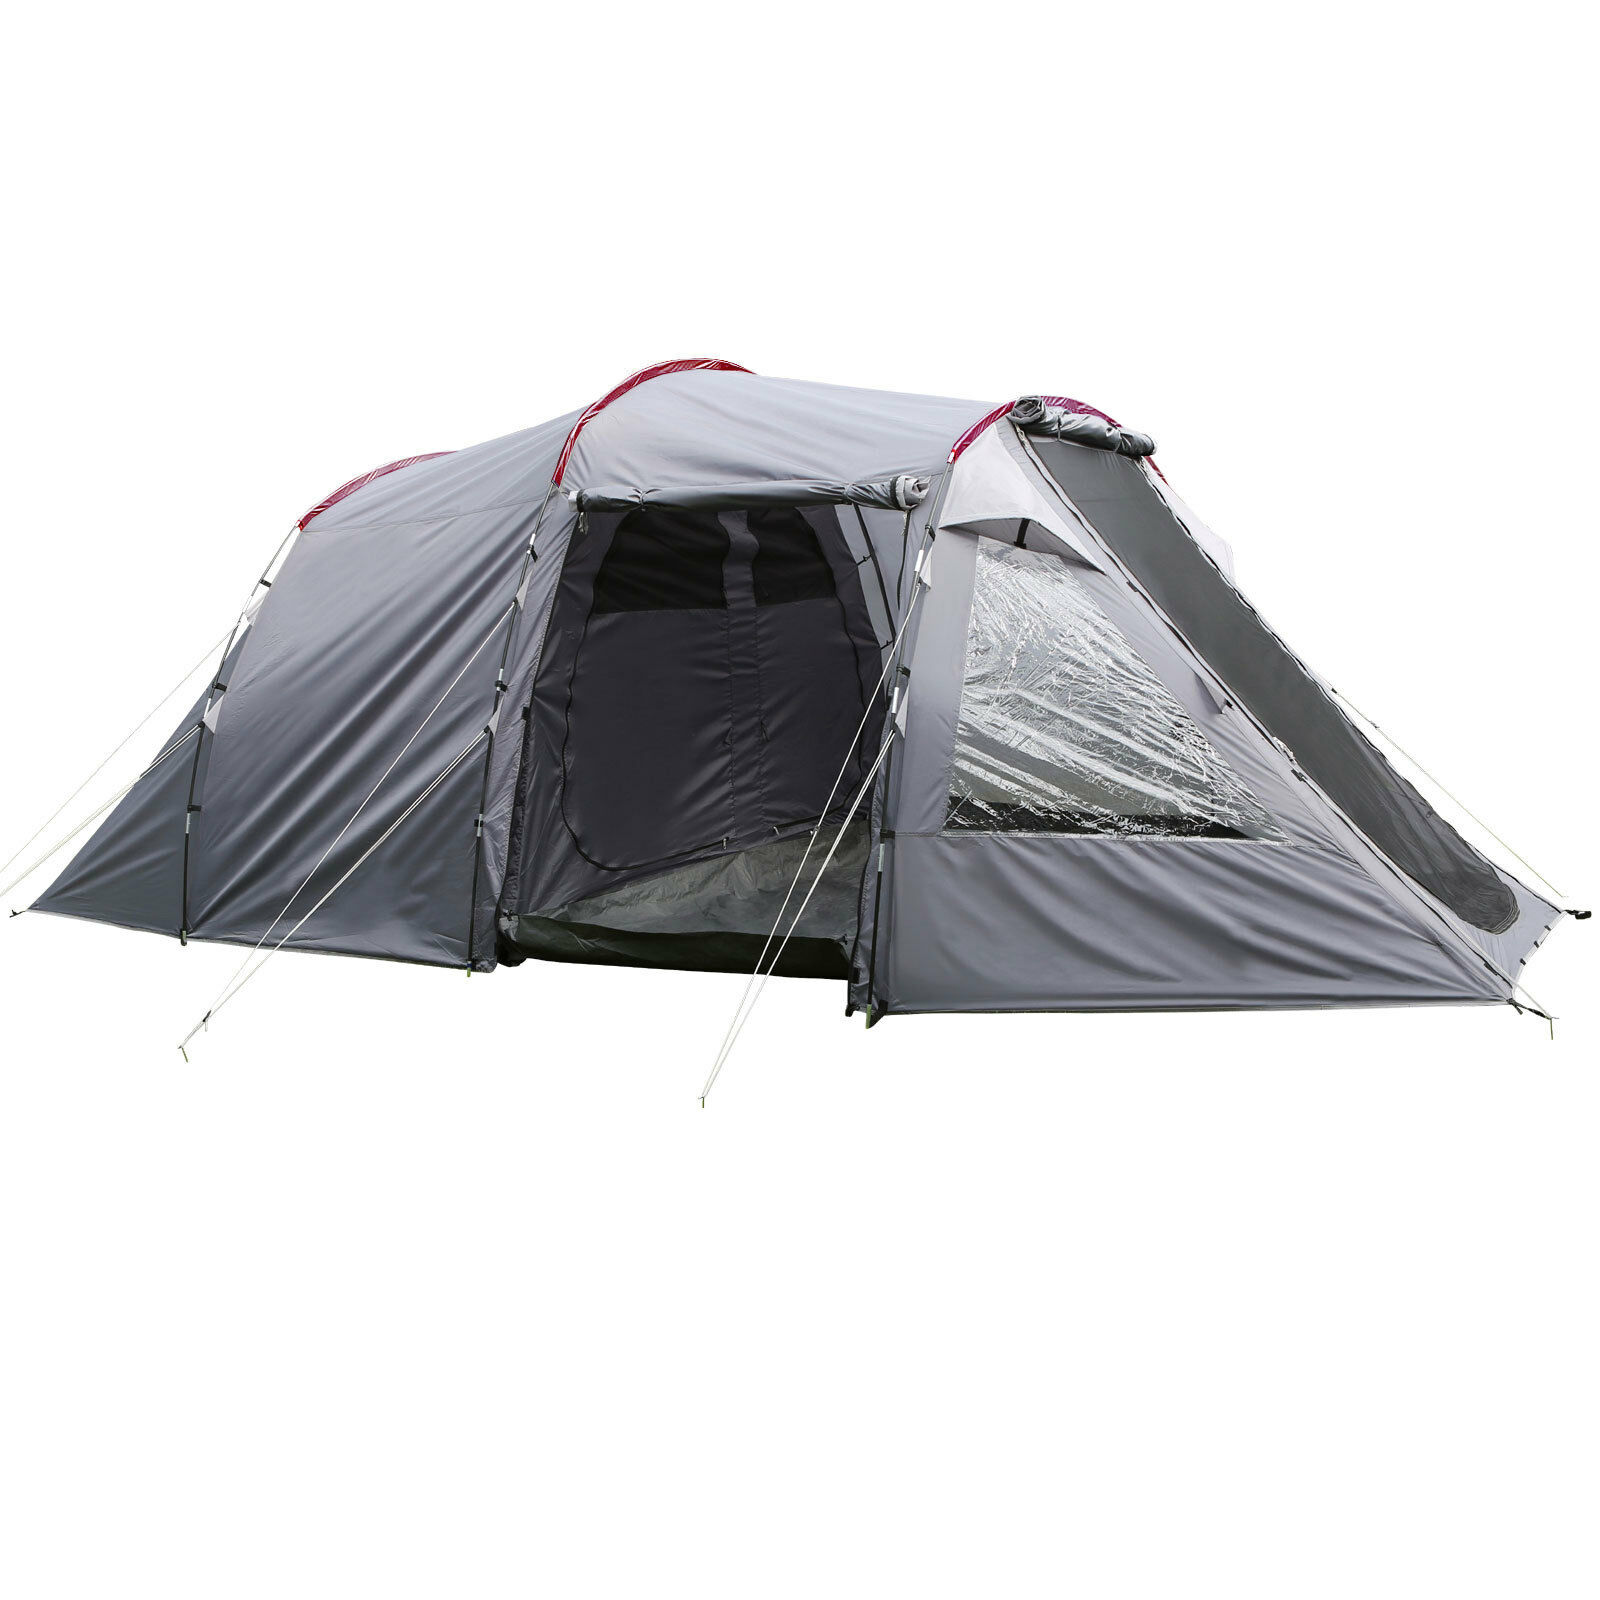 High kleurado Garda 4 Persons Tent Grote Tent Family Tent Group Tent